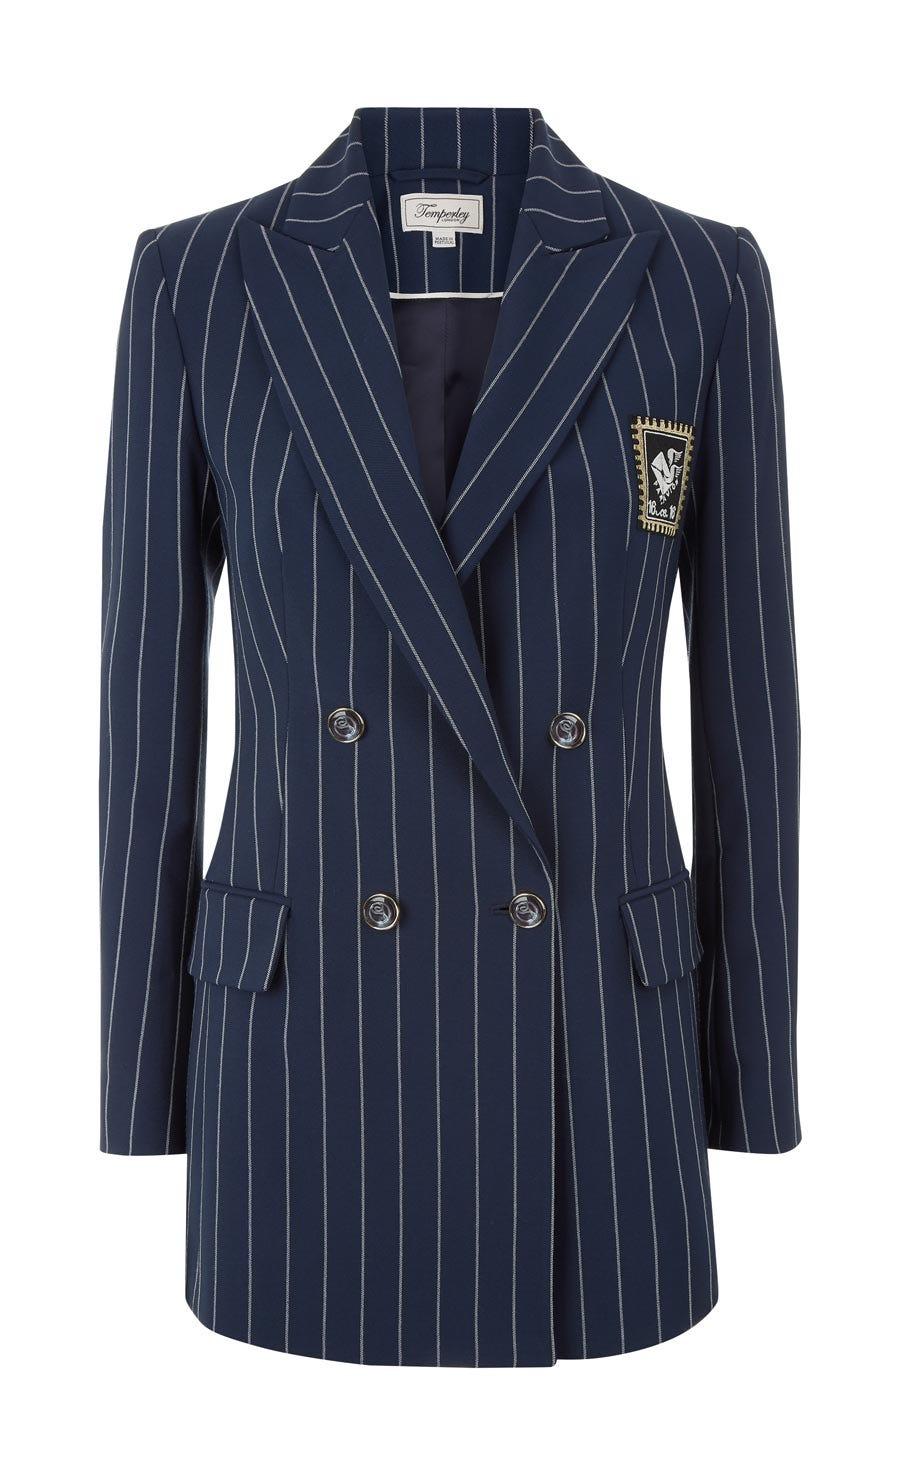 Francesca Tailored Jacket